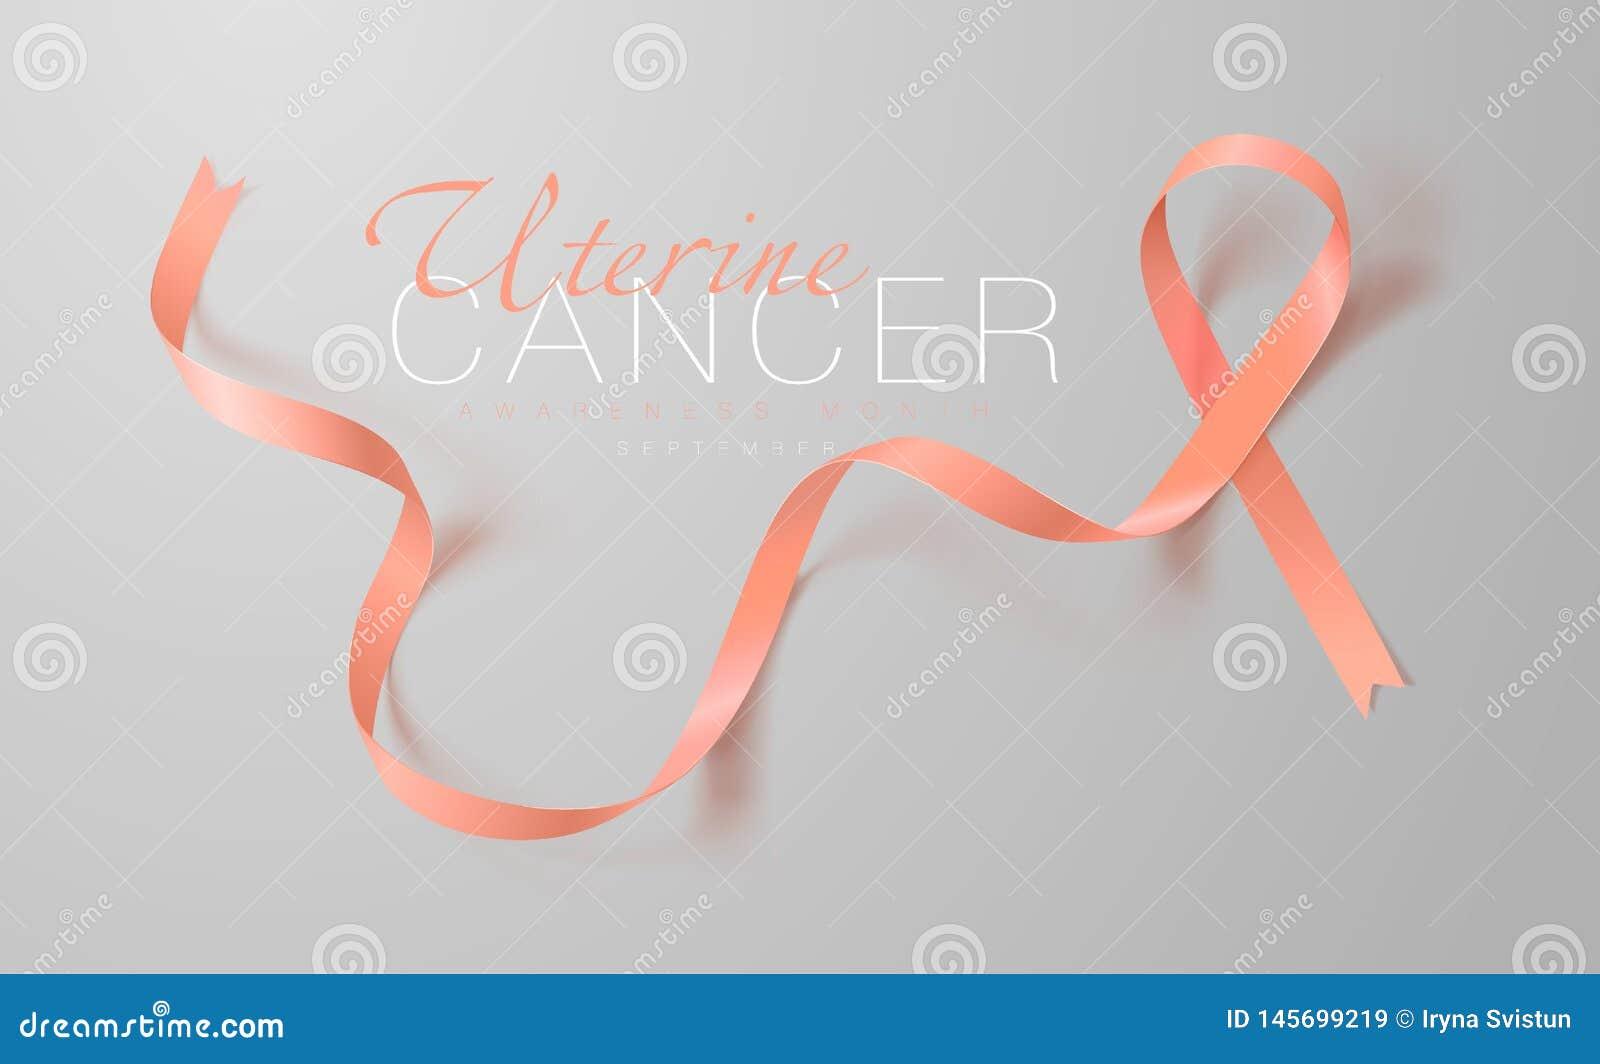 uterine cancer awareness month